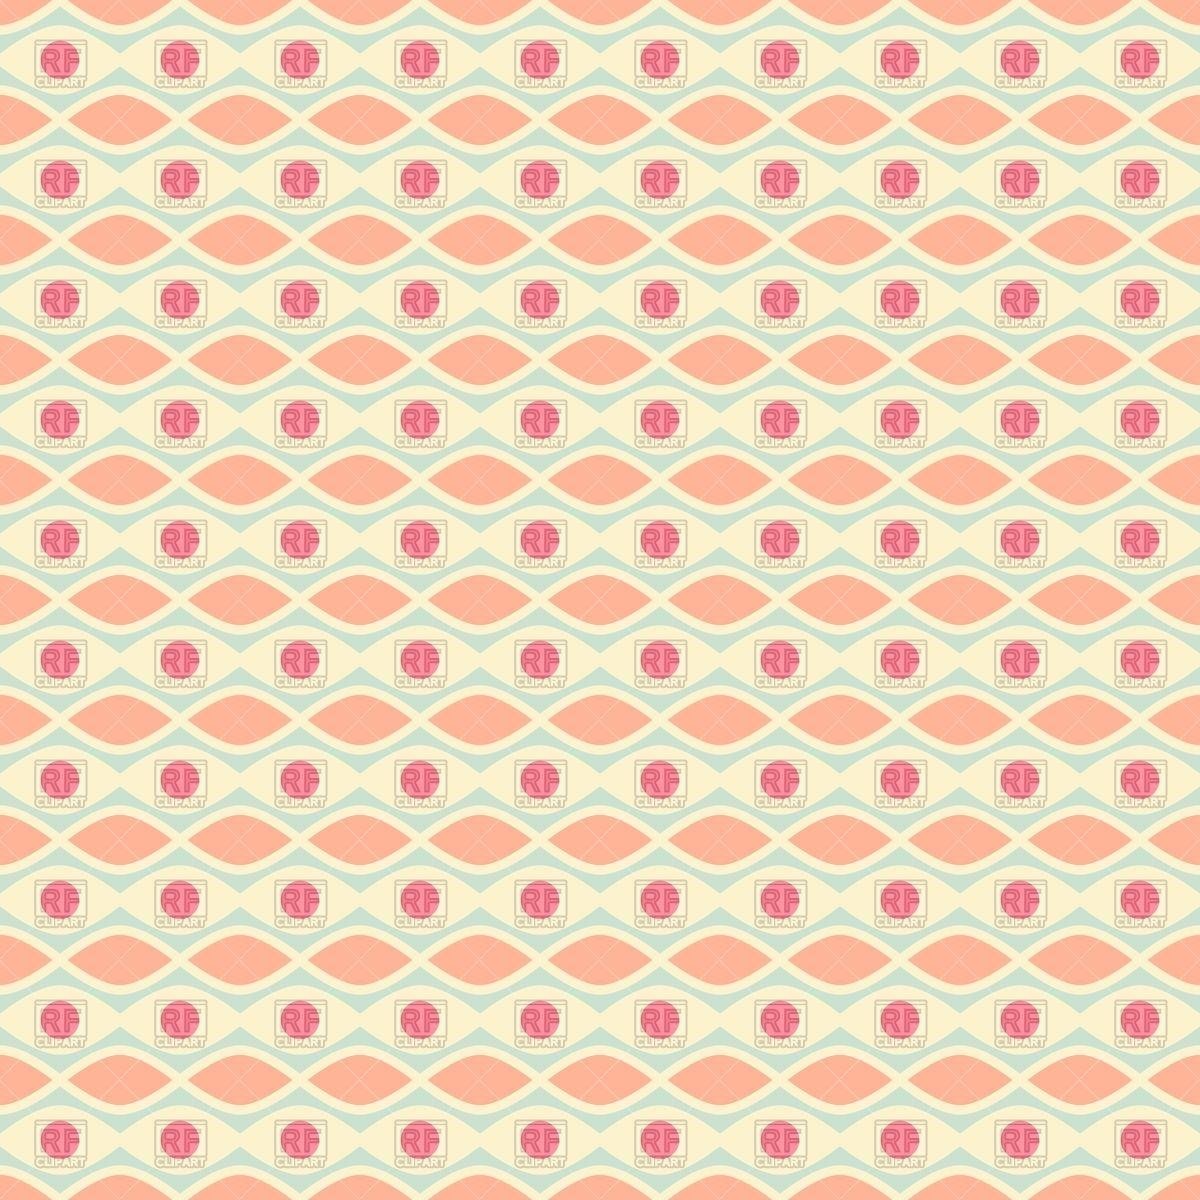 1200x1200 Pink Pastel Retro Background Vector Image Vector Artwork Of